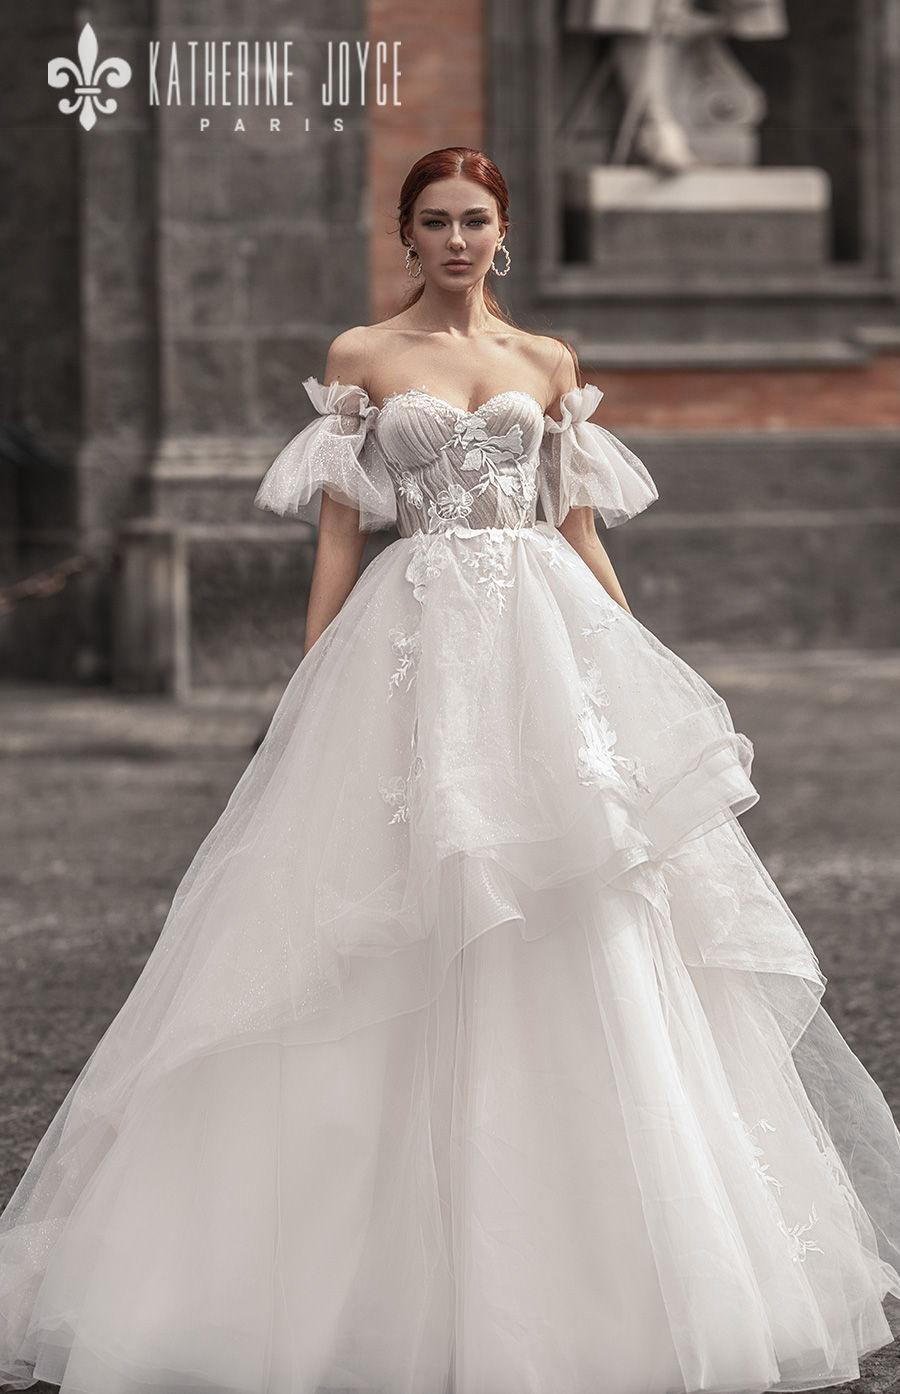 katherine joyce 2021 naples bridal off the shoulder half lantern sleeves sweetheart neckline heavily embellished bodice tiered skirt romantic a line wedding dress mid back (kaya) mv